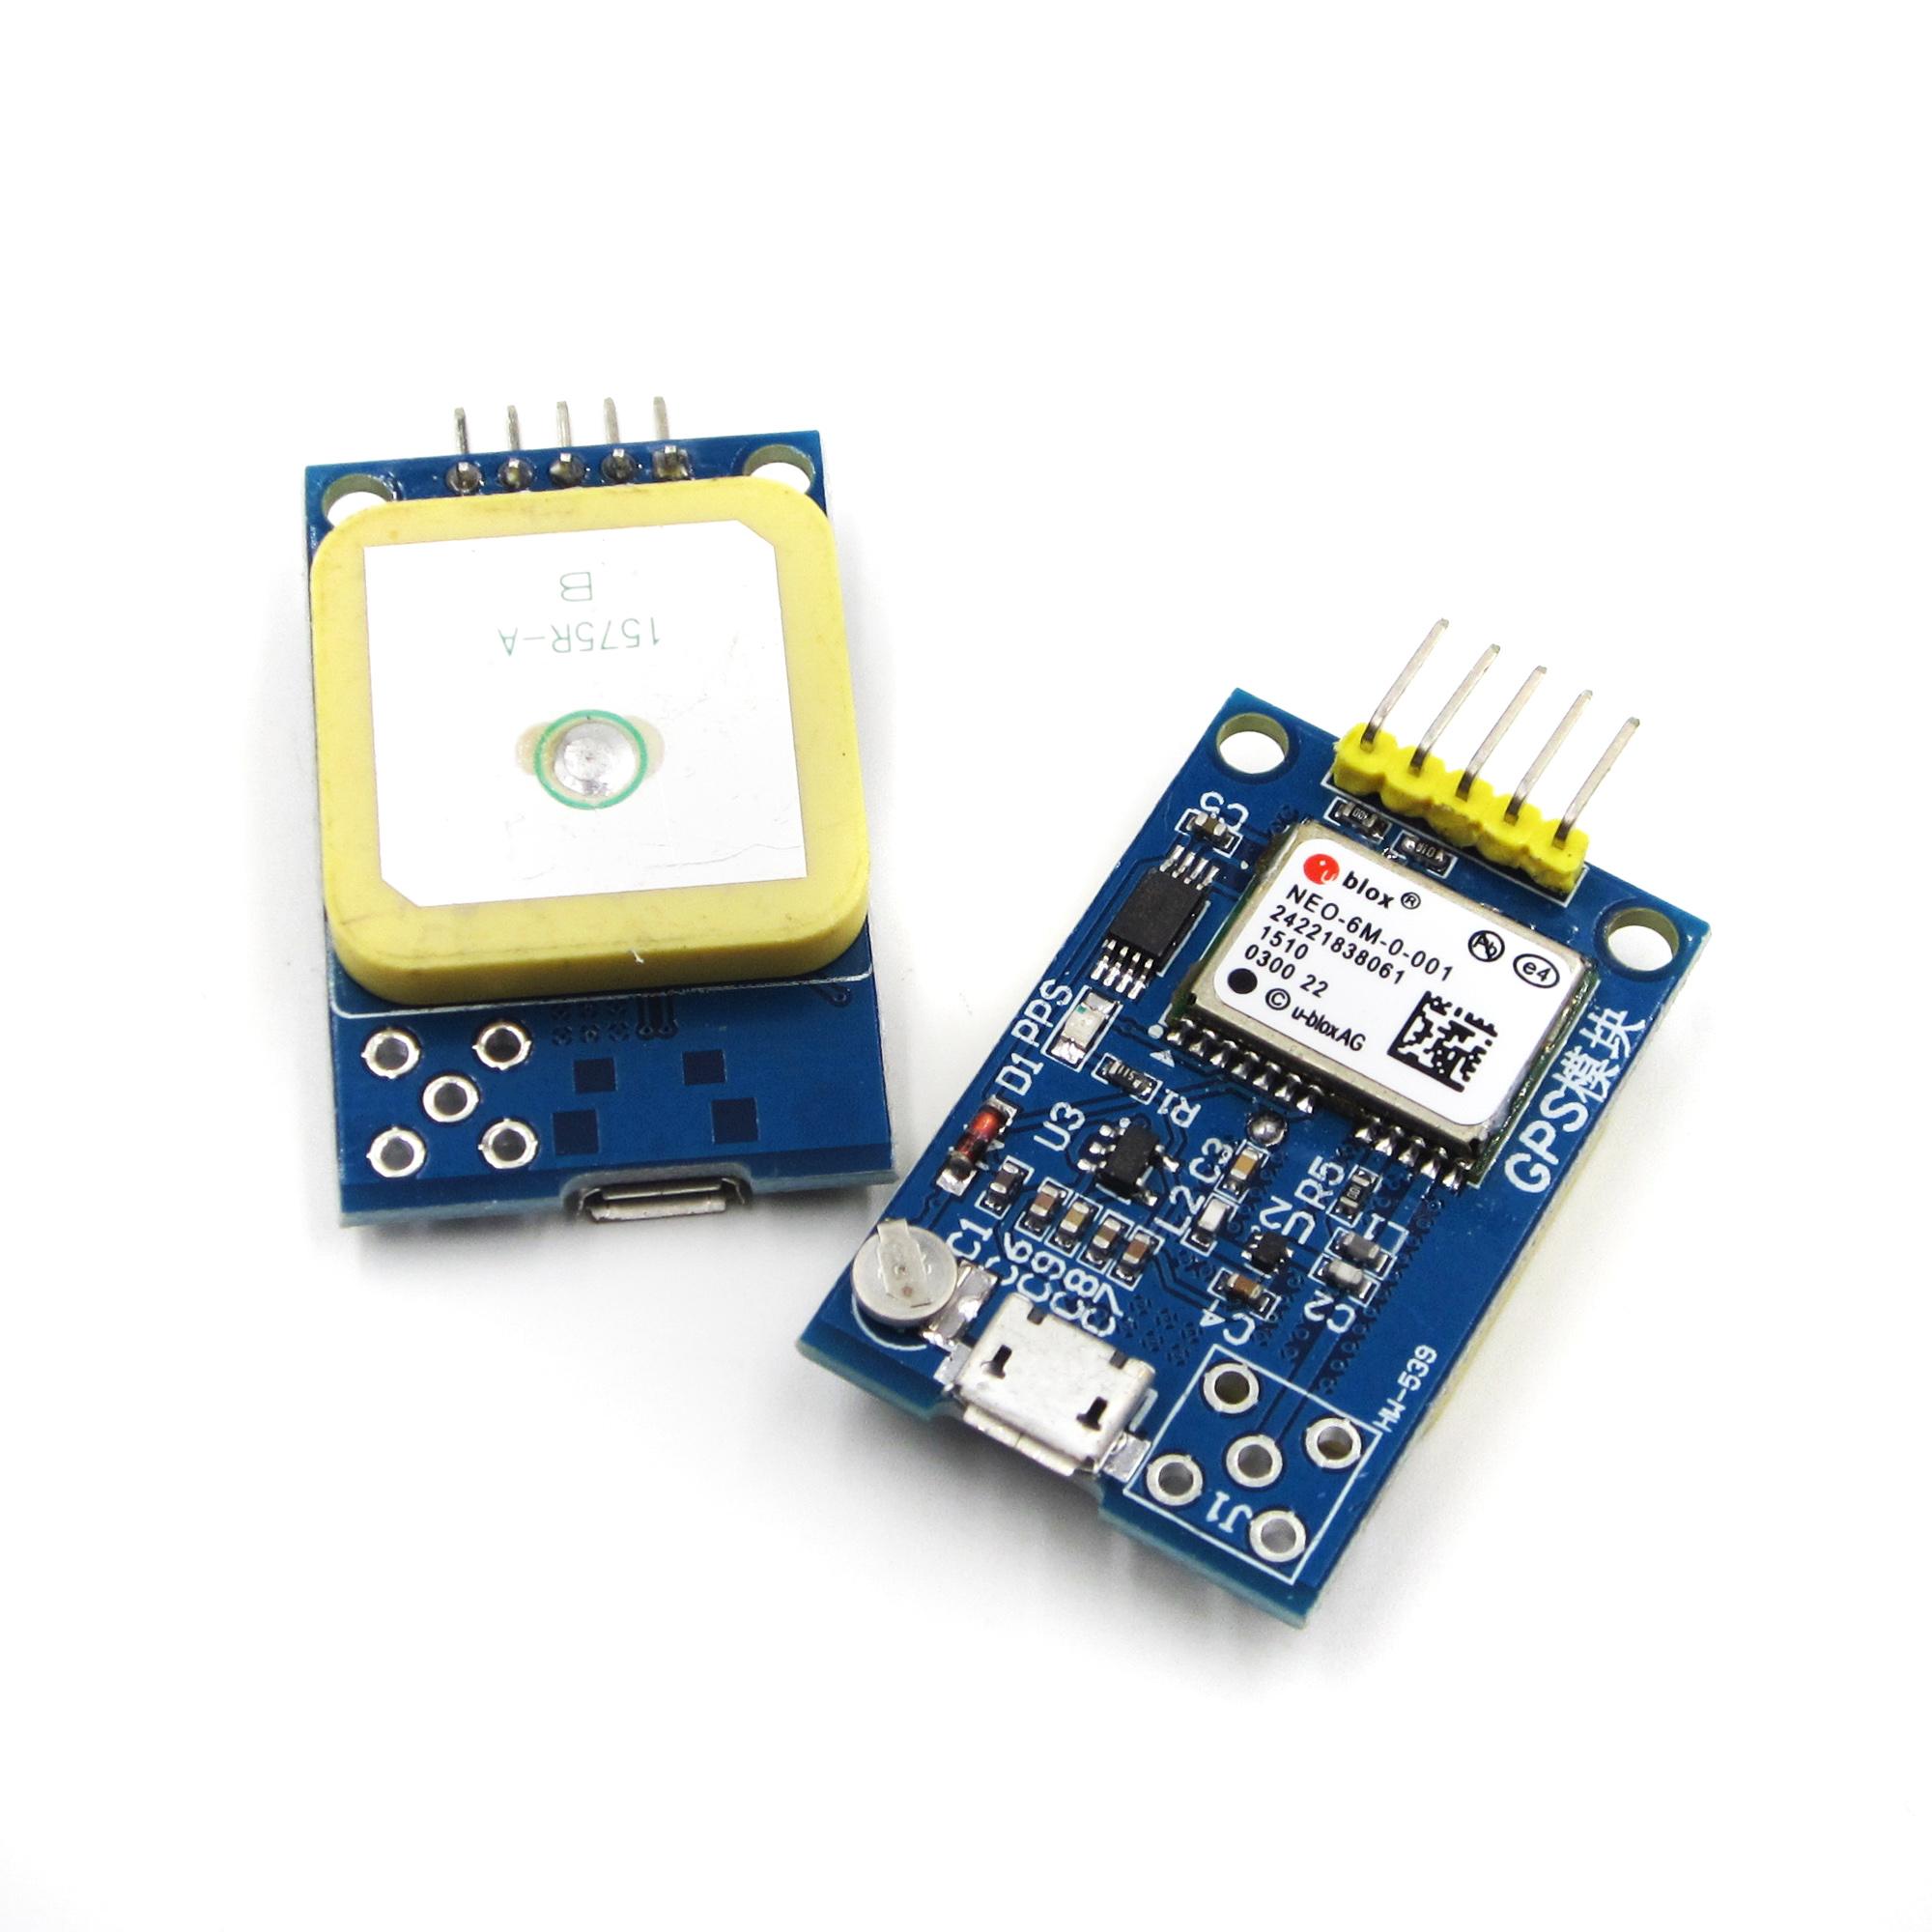 NEO 6M GPS Satellite Positioning Module Dev Board for Arduino STM32 C51